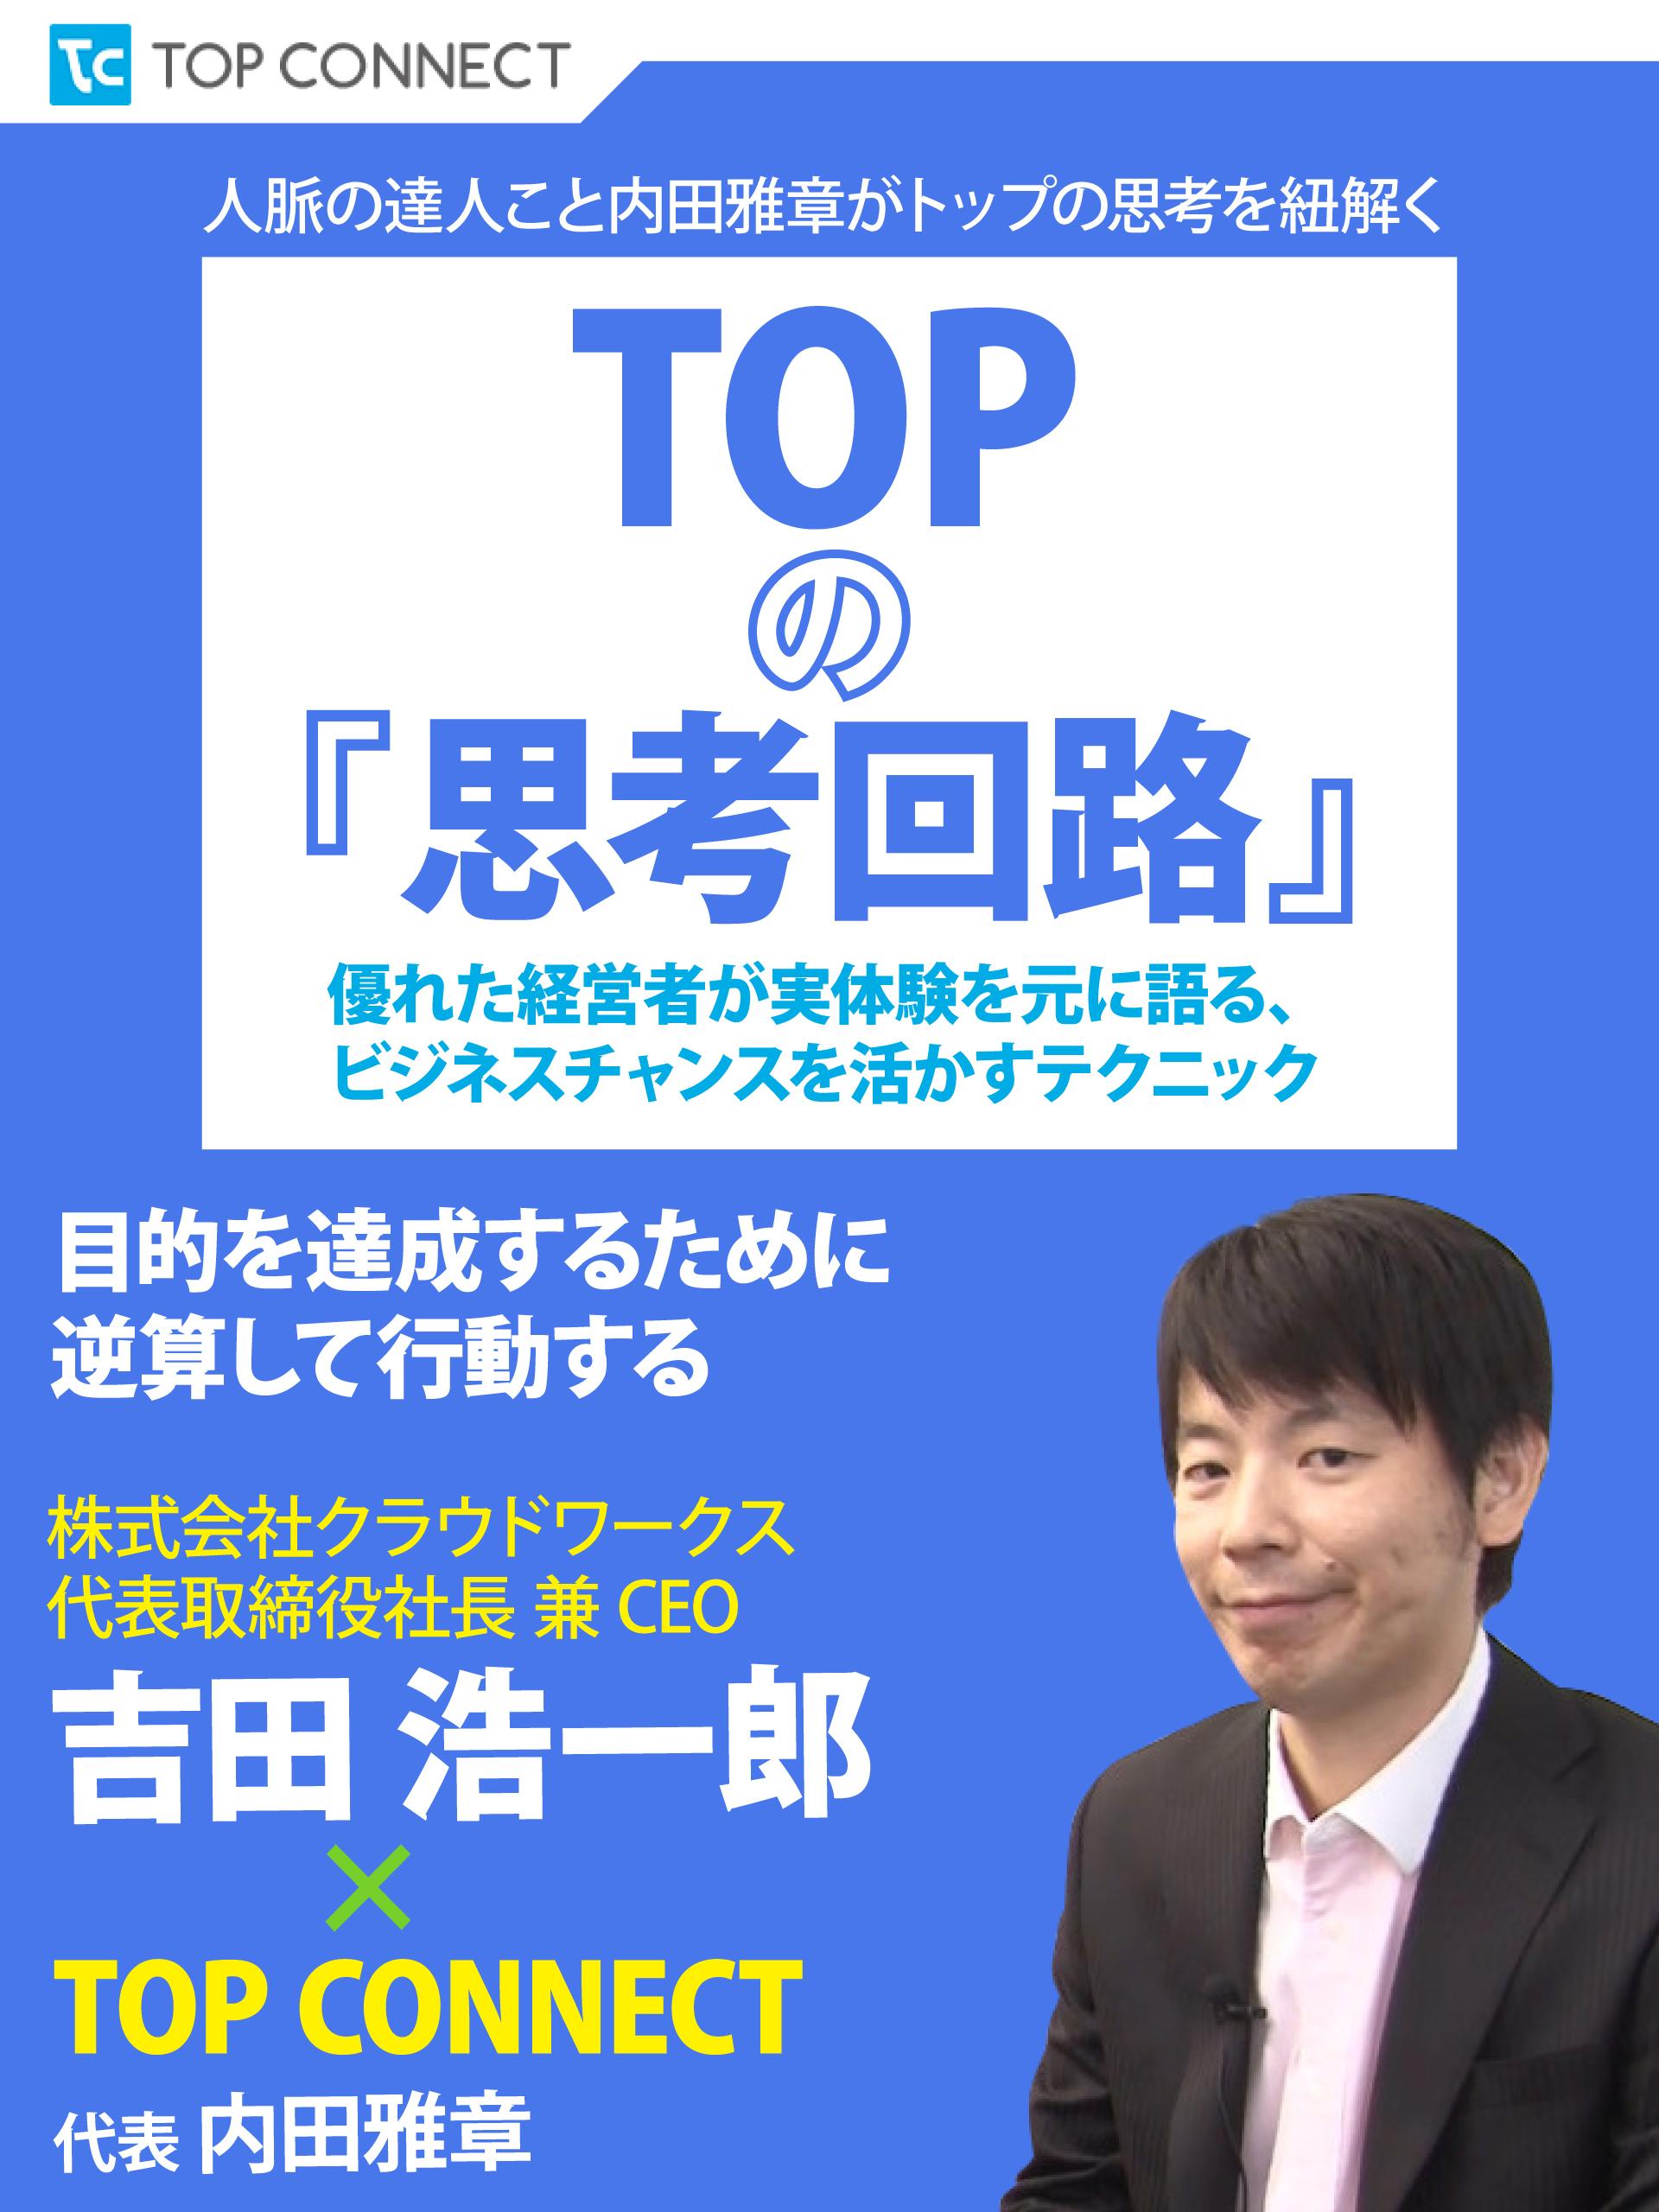 TOPの『思考回路』 株式会社クラウドワークス 代表取締役社長 兼 CEO 吉田浩一郎×TOP CONNECT